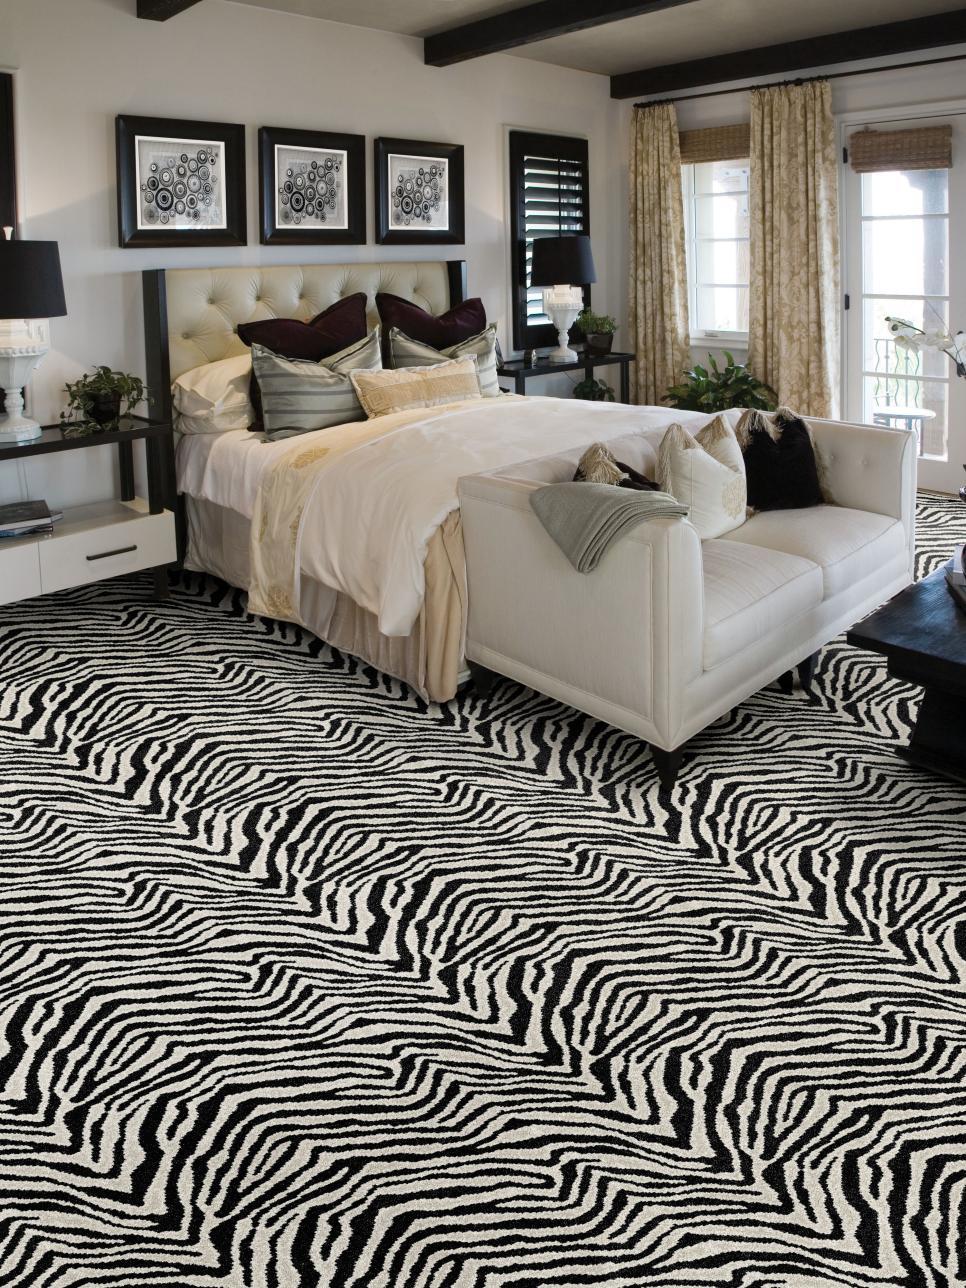 Carpet design ideas loft living room KFXFPIN